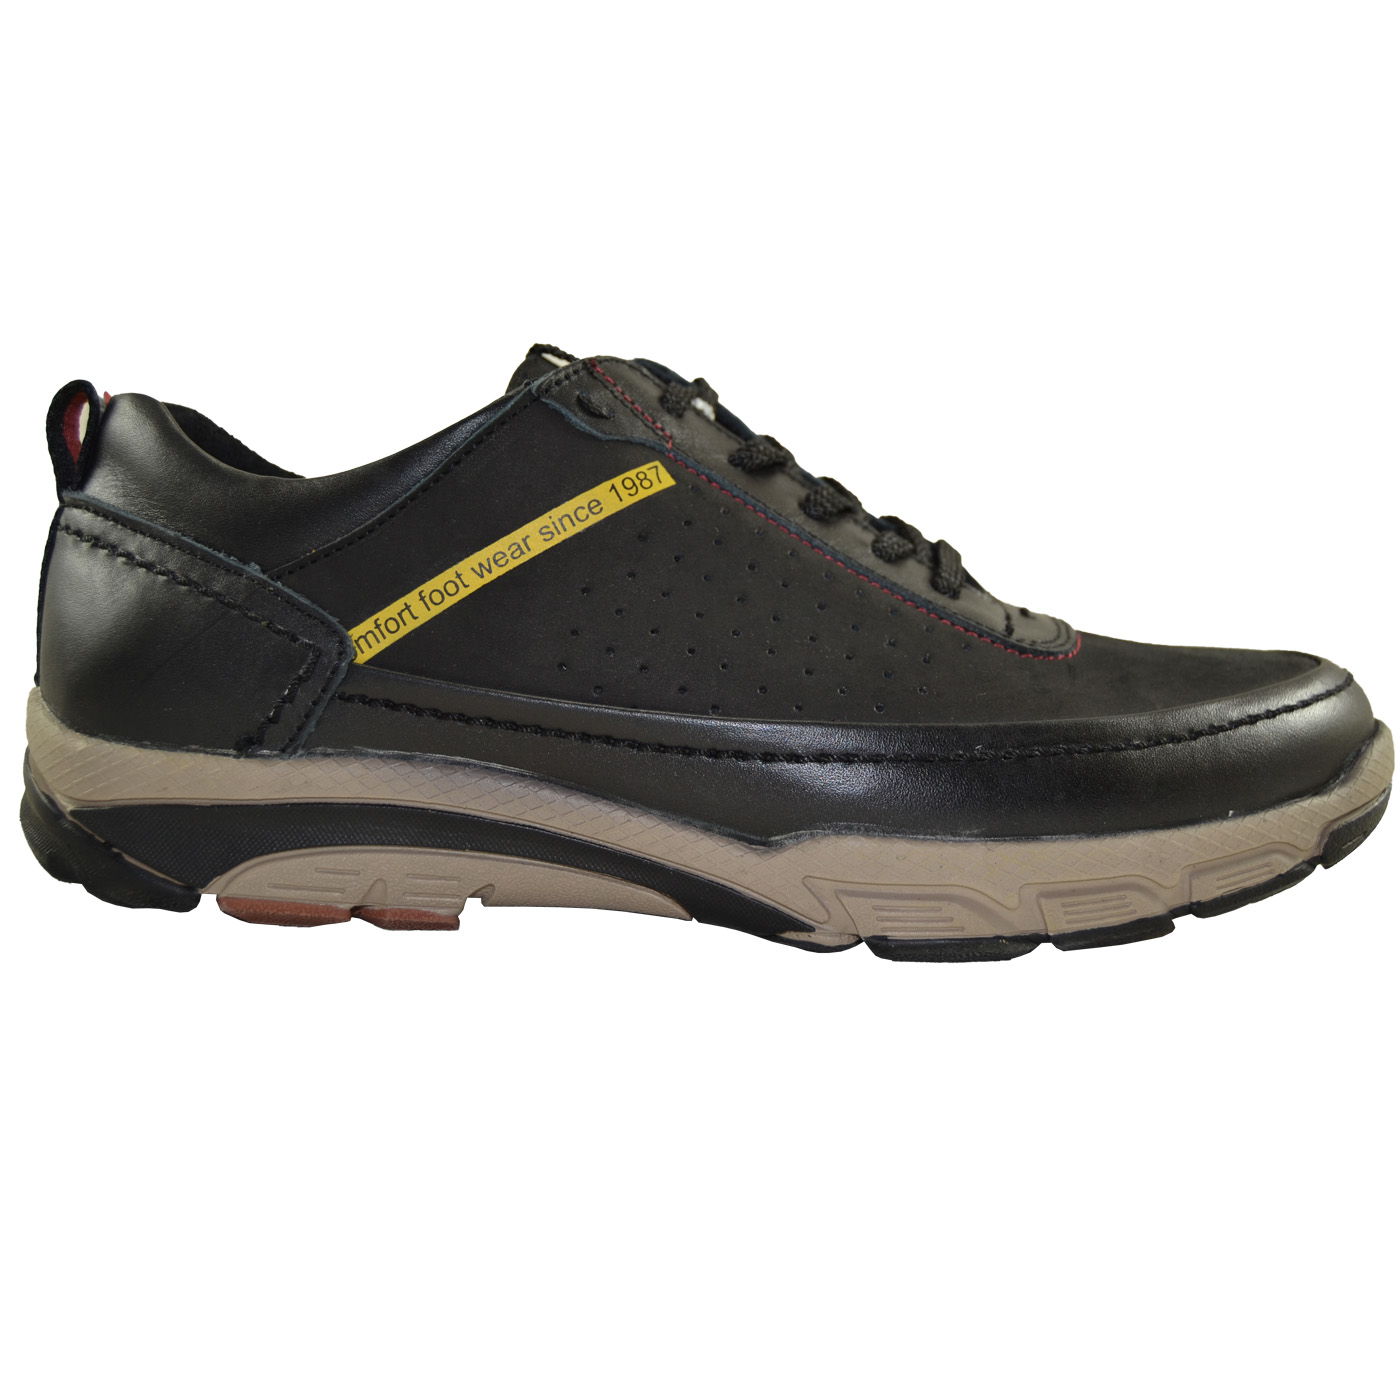 قیمت خرید کفش روزمره مردانه کد 292 اورجینال